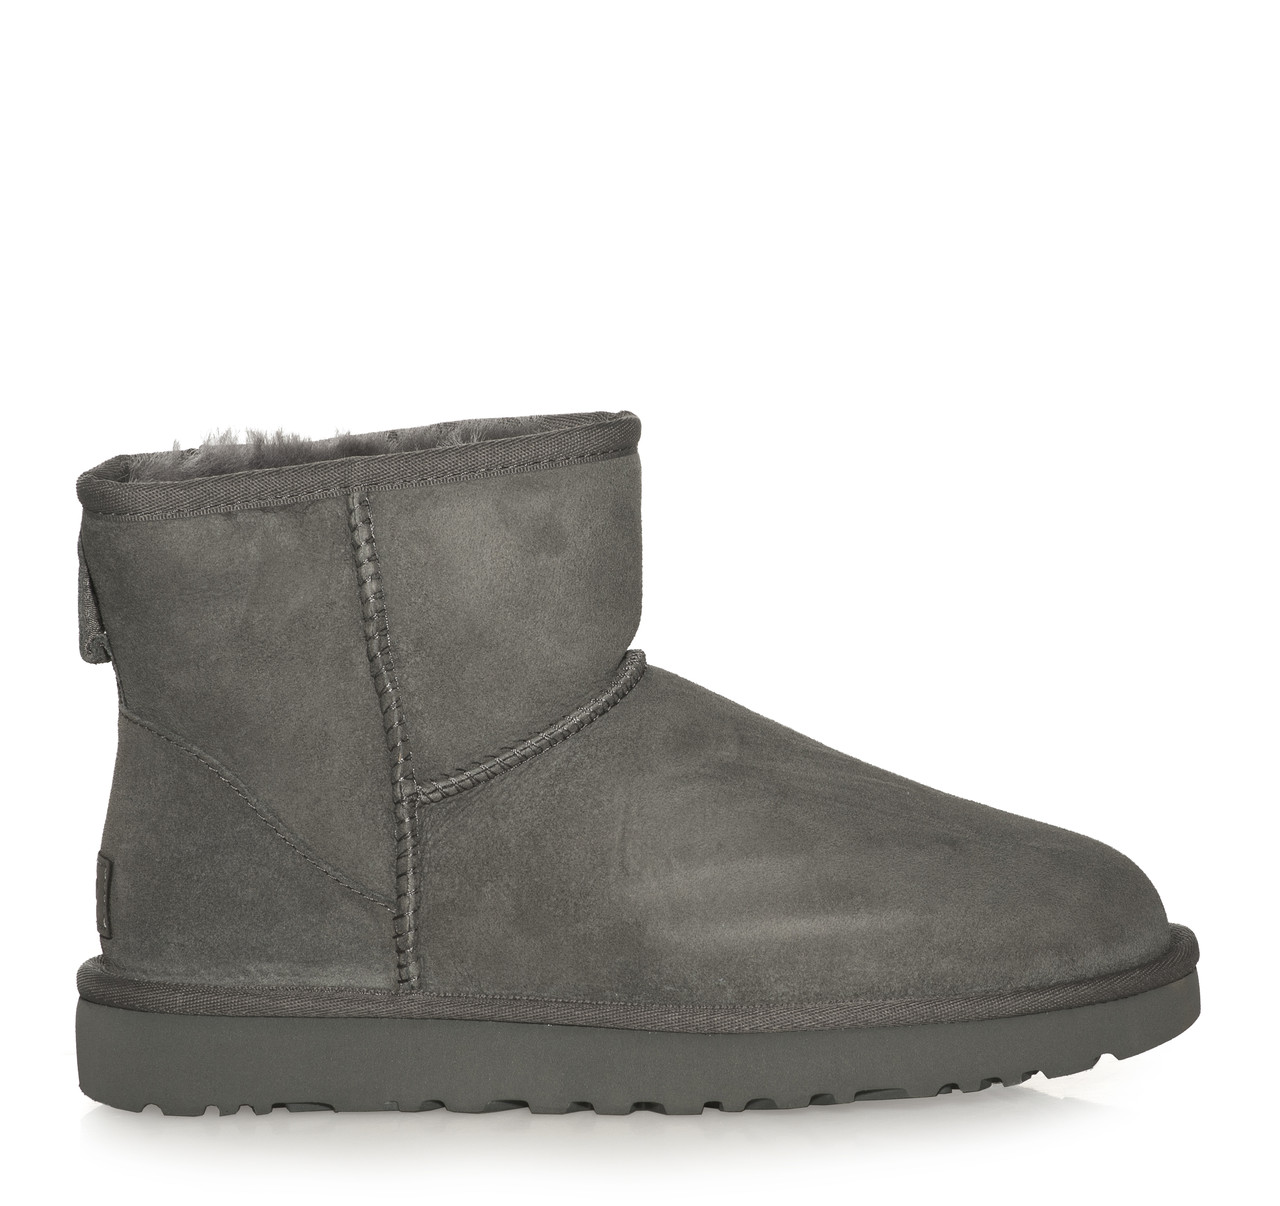 784e1b7a76a Γυναικεία > Παπούτσια > Μποτάκια / Μποτάκια Mariamare Tablada ...